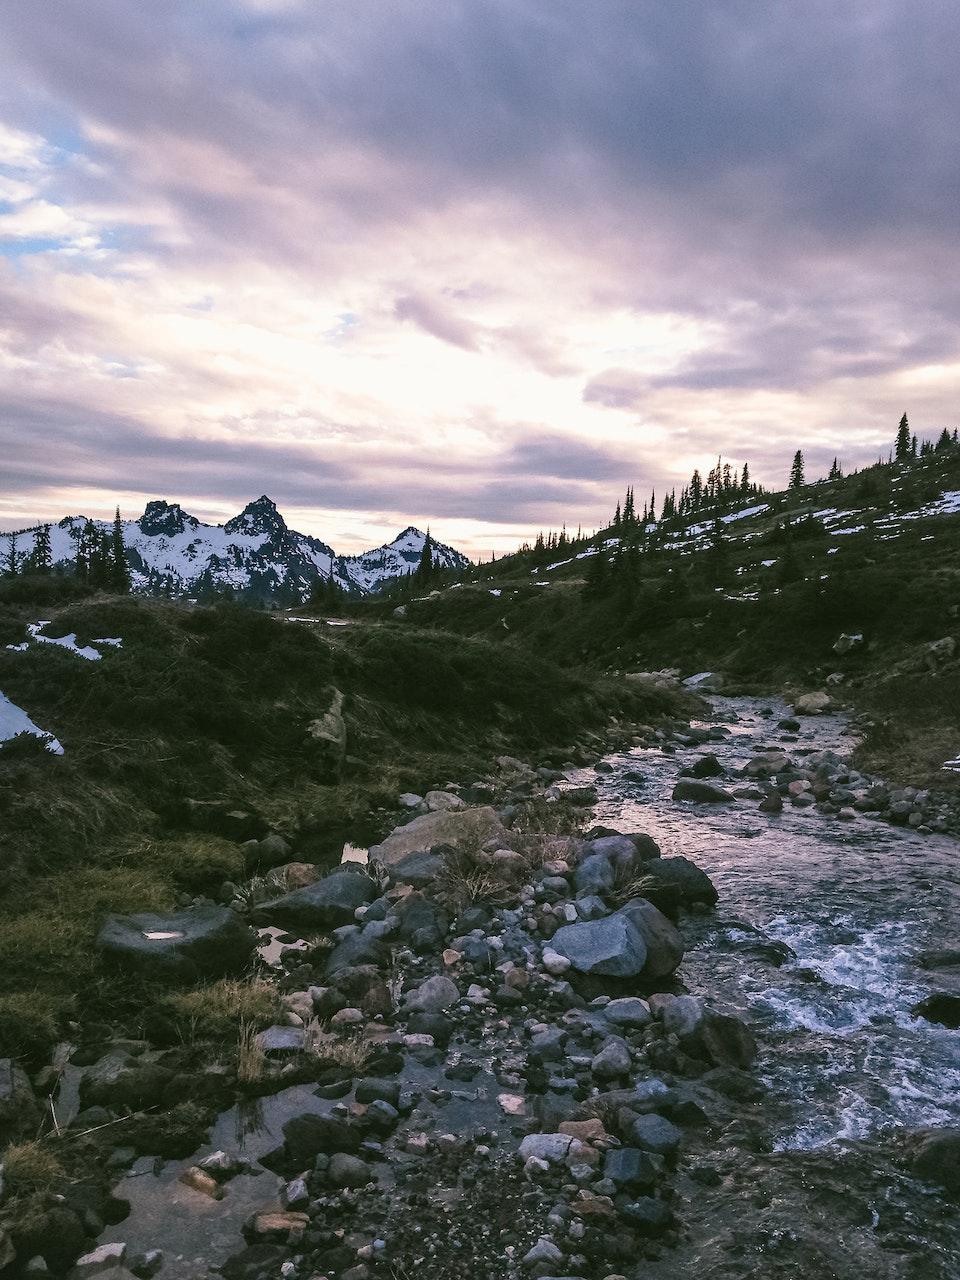 Phone - Paradise; Mount Rainier National Park, WA